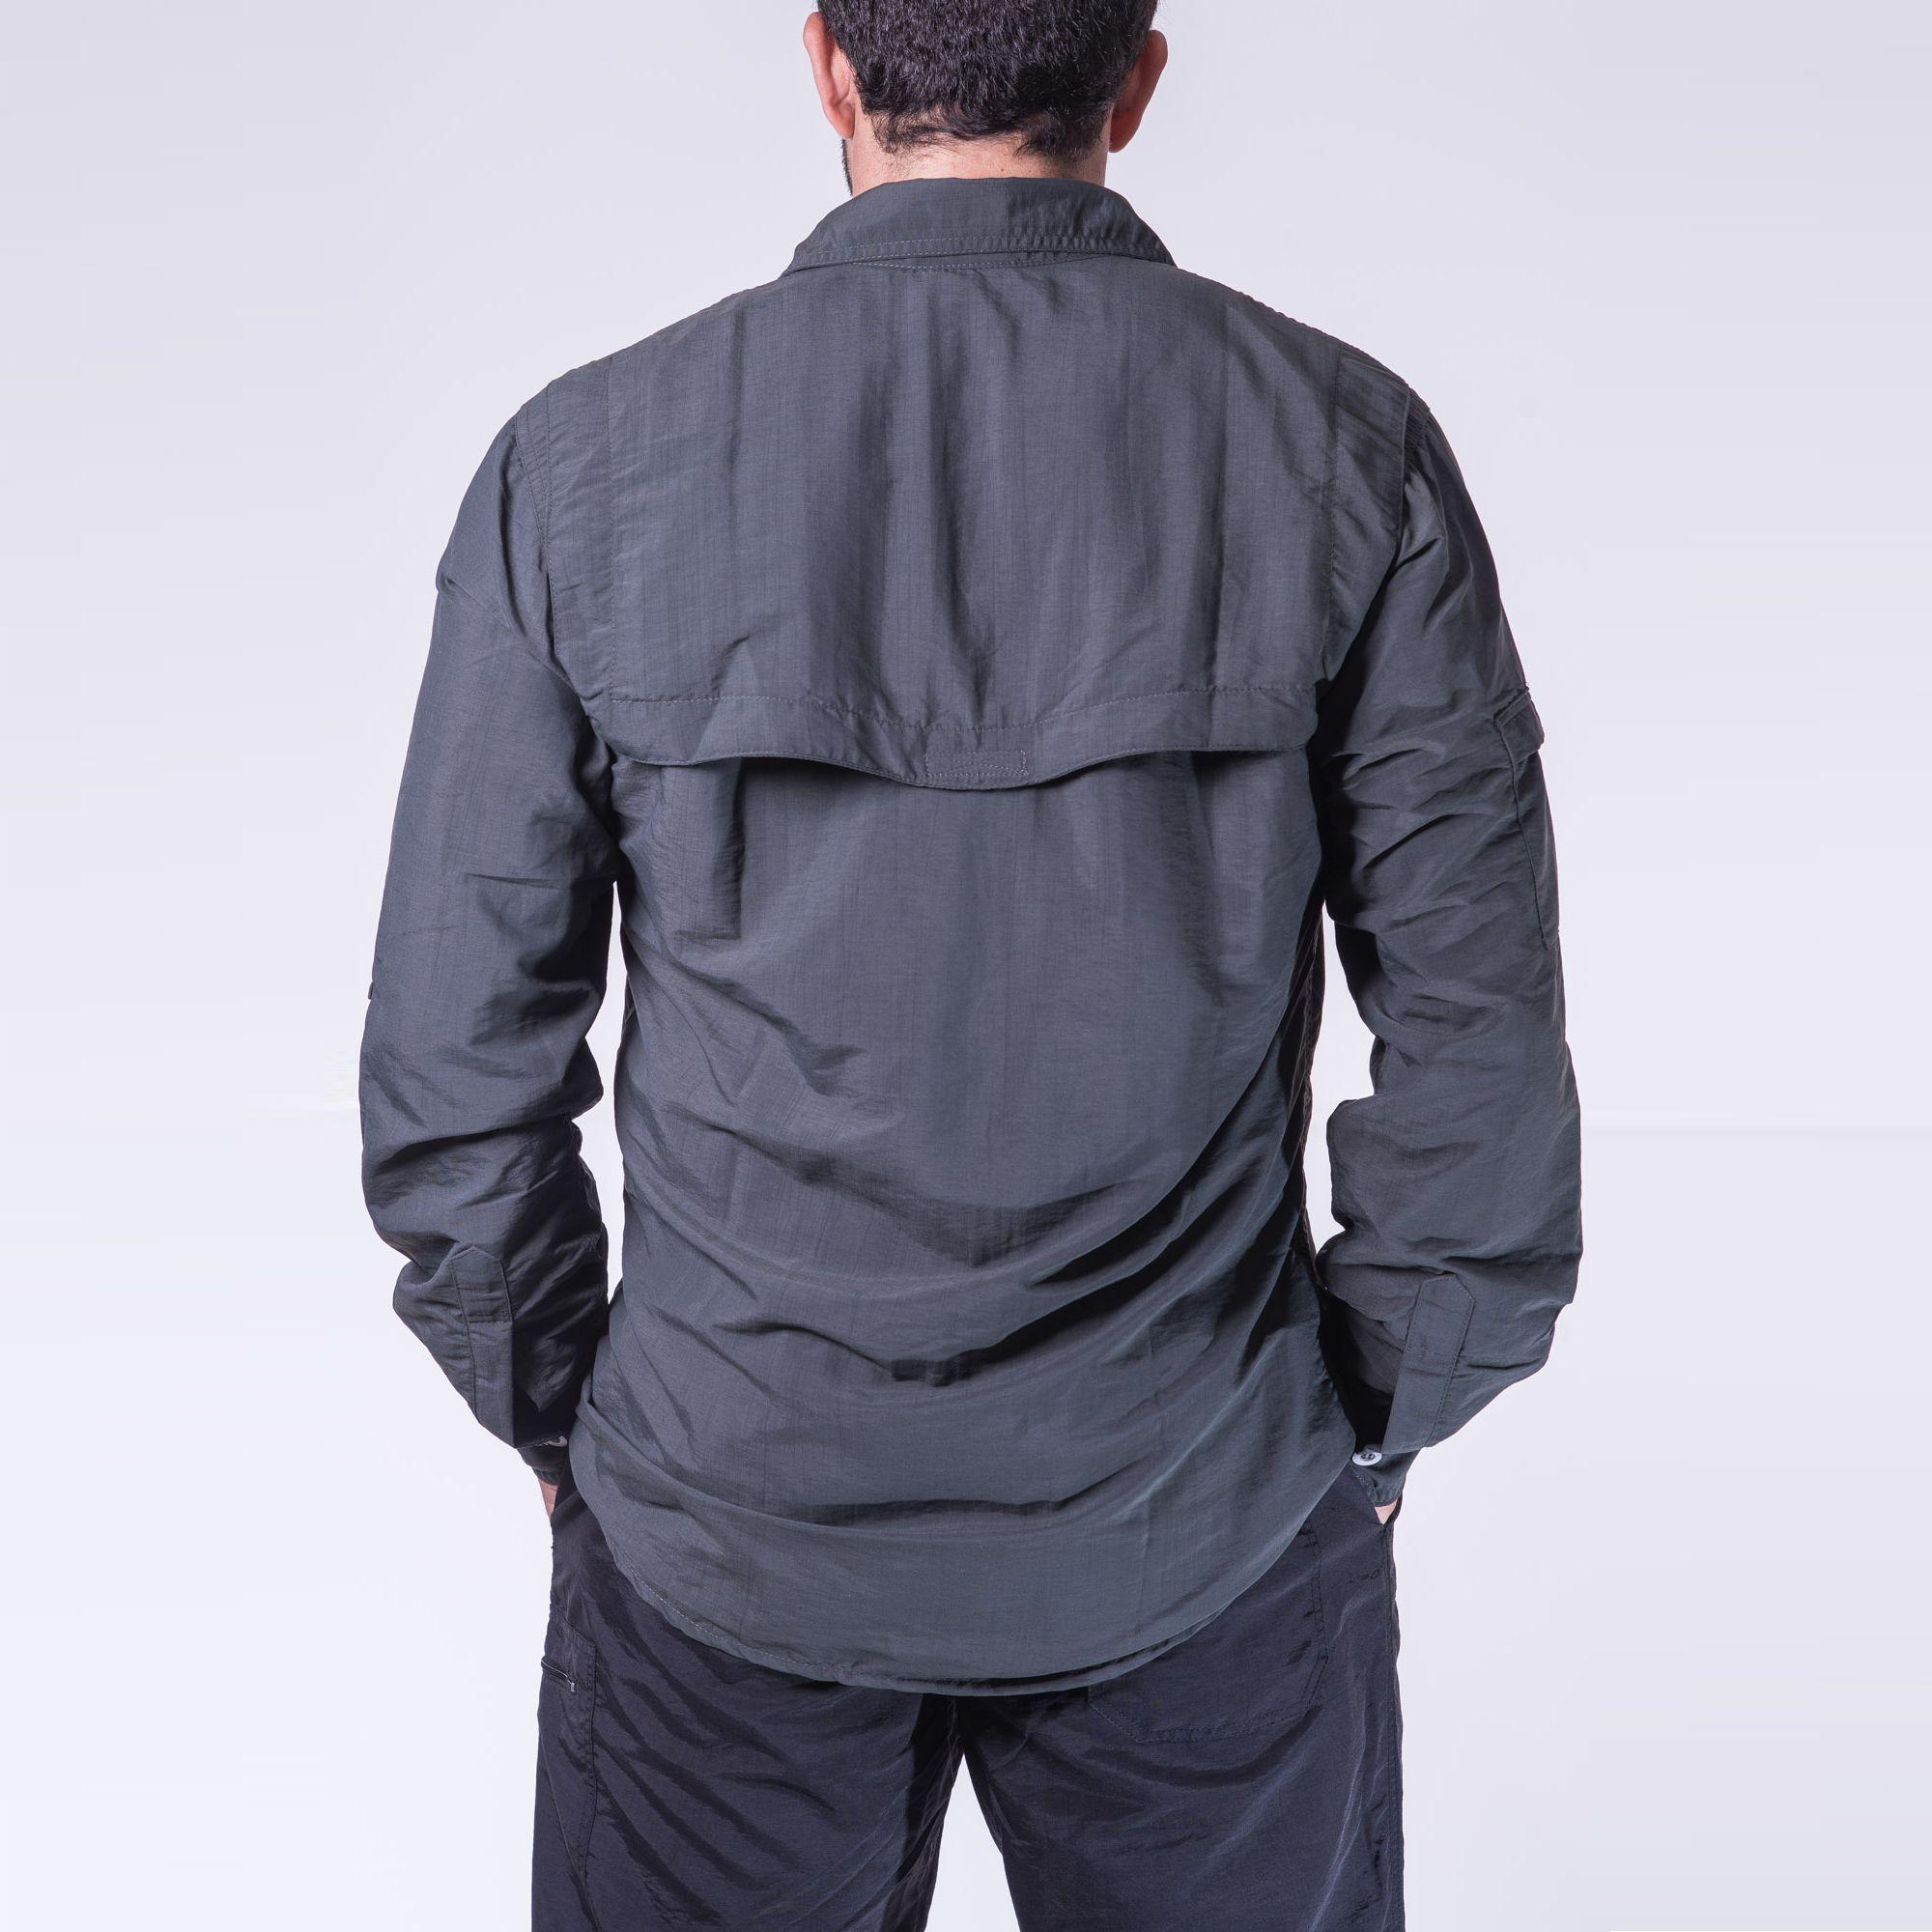 Lançamento - Camisa Safári Masculina Chumbo | Hard Adventure